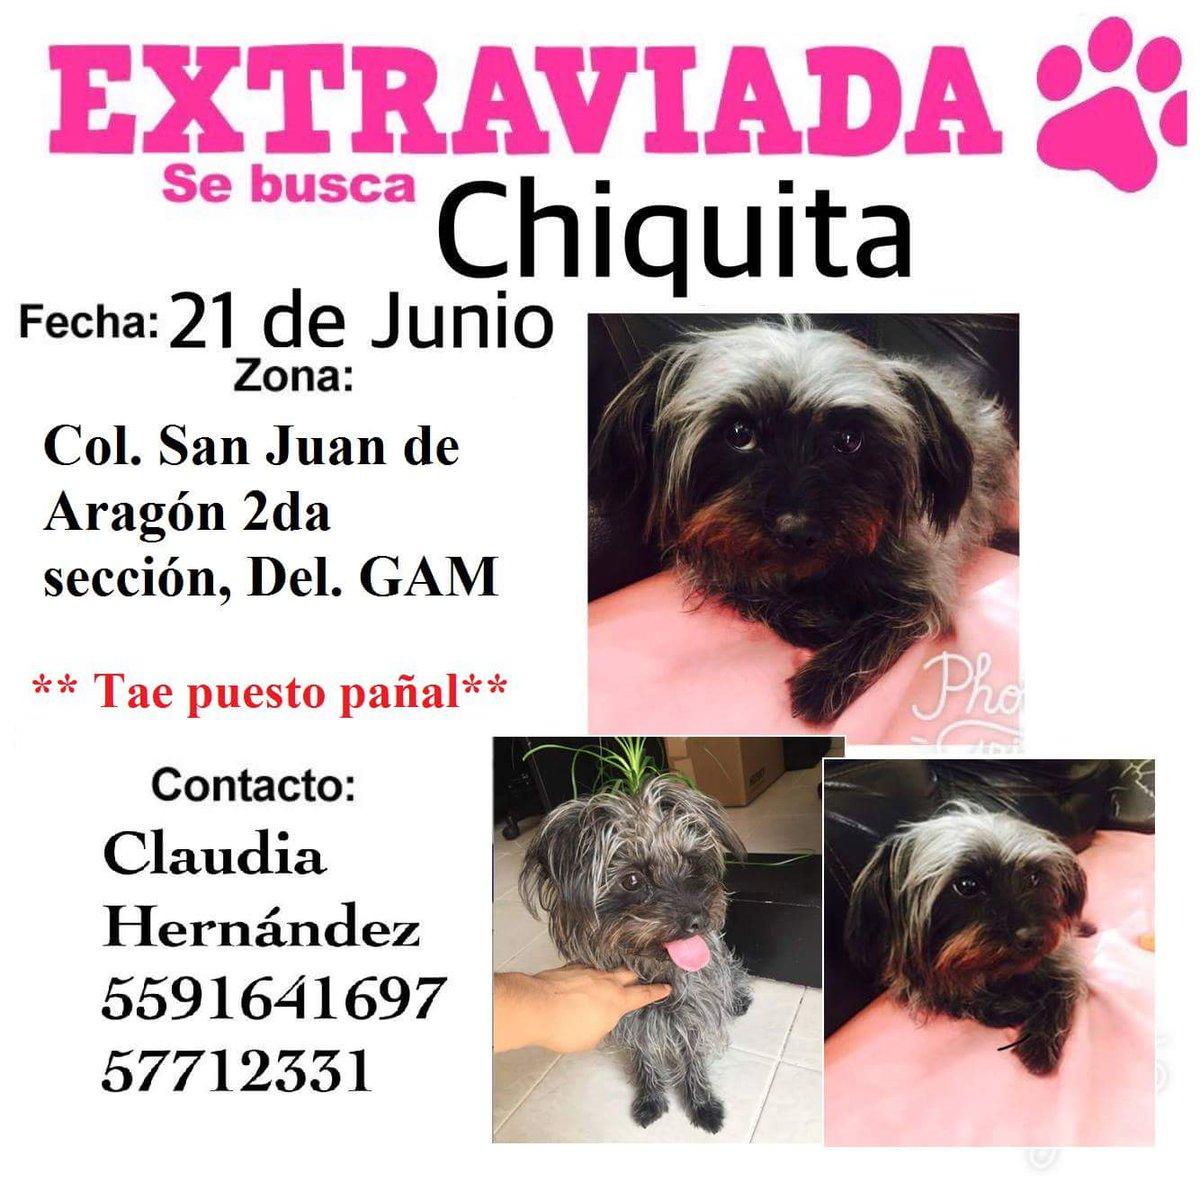 #SEBUSCA #CHIQUITA #HEMBRA #SANJUAN DEARAGON #SEGUNDASECC #GAM @GAM_xTi @Lindavista_GAM @sebuscaCdMx @PetBookMexico @perruna_ac @911Canino <br>http://pic.twitter.com/zfPDtDdeBF